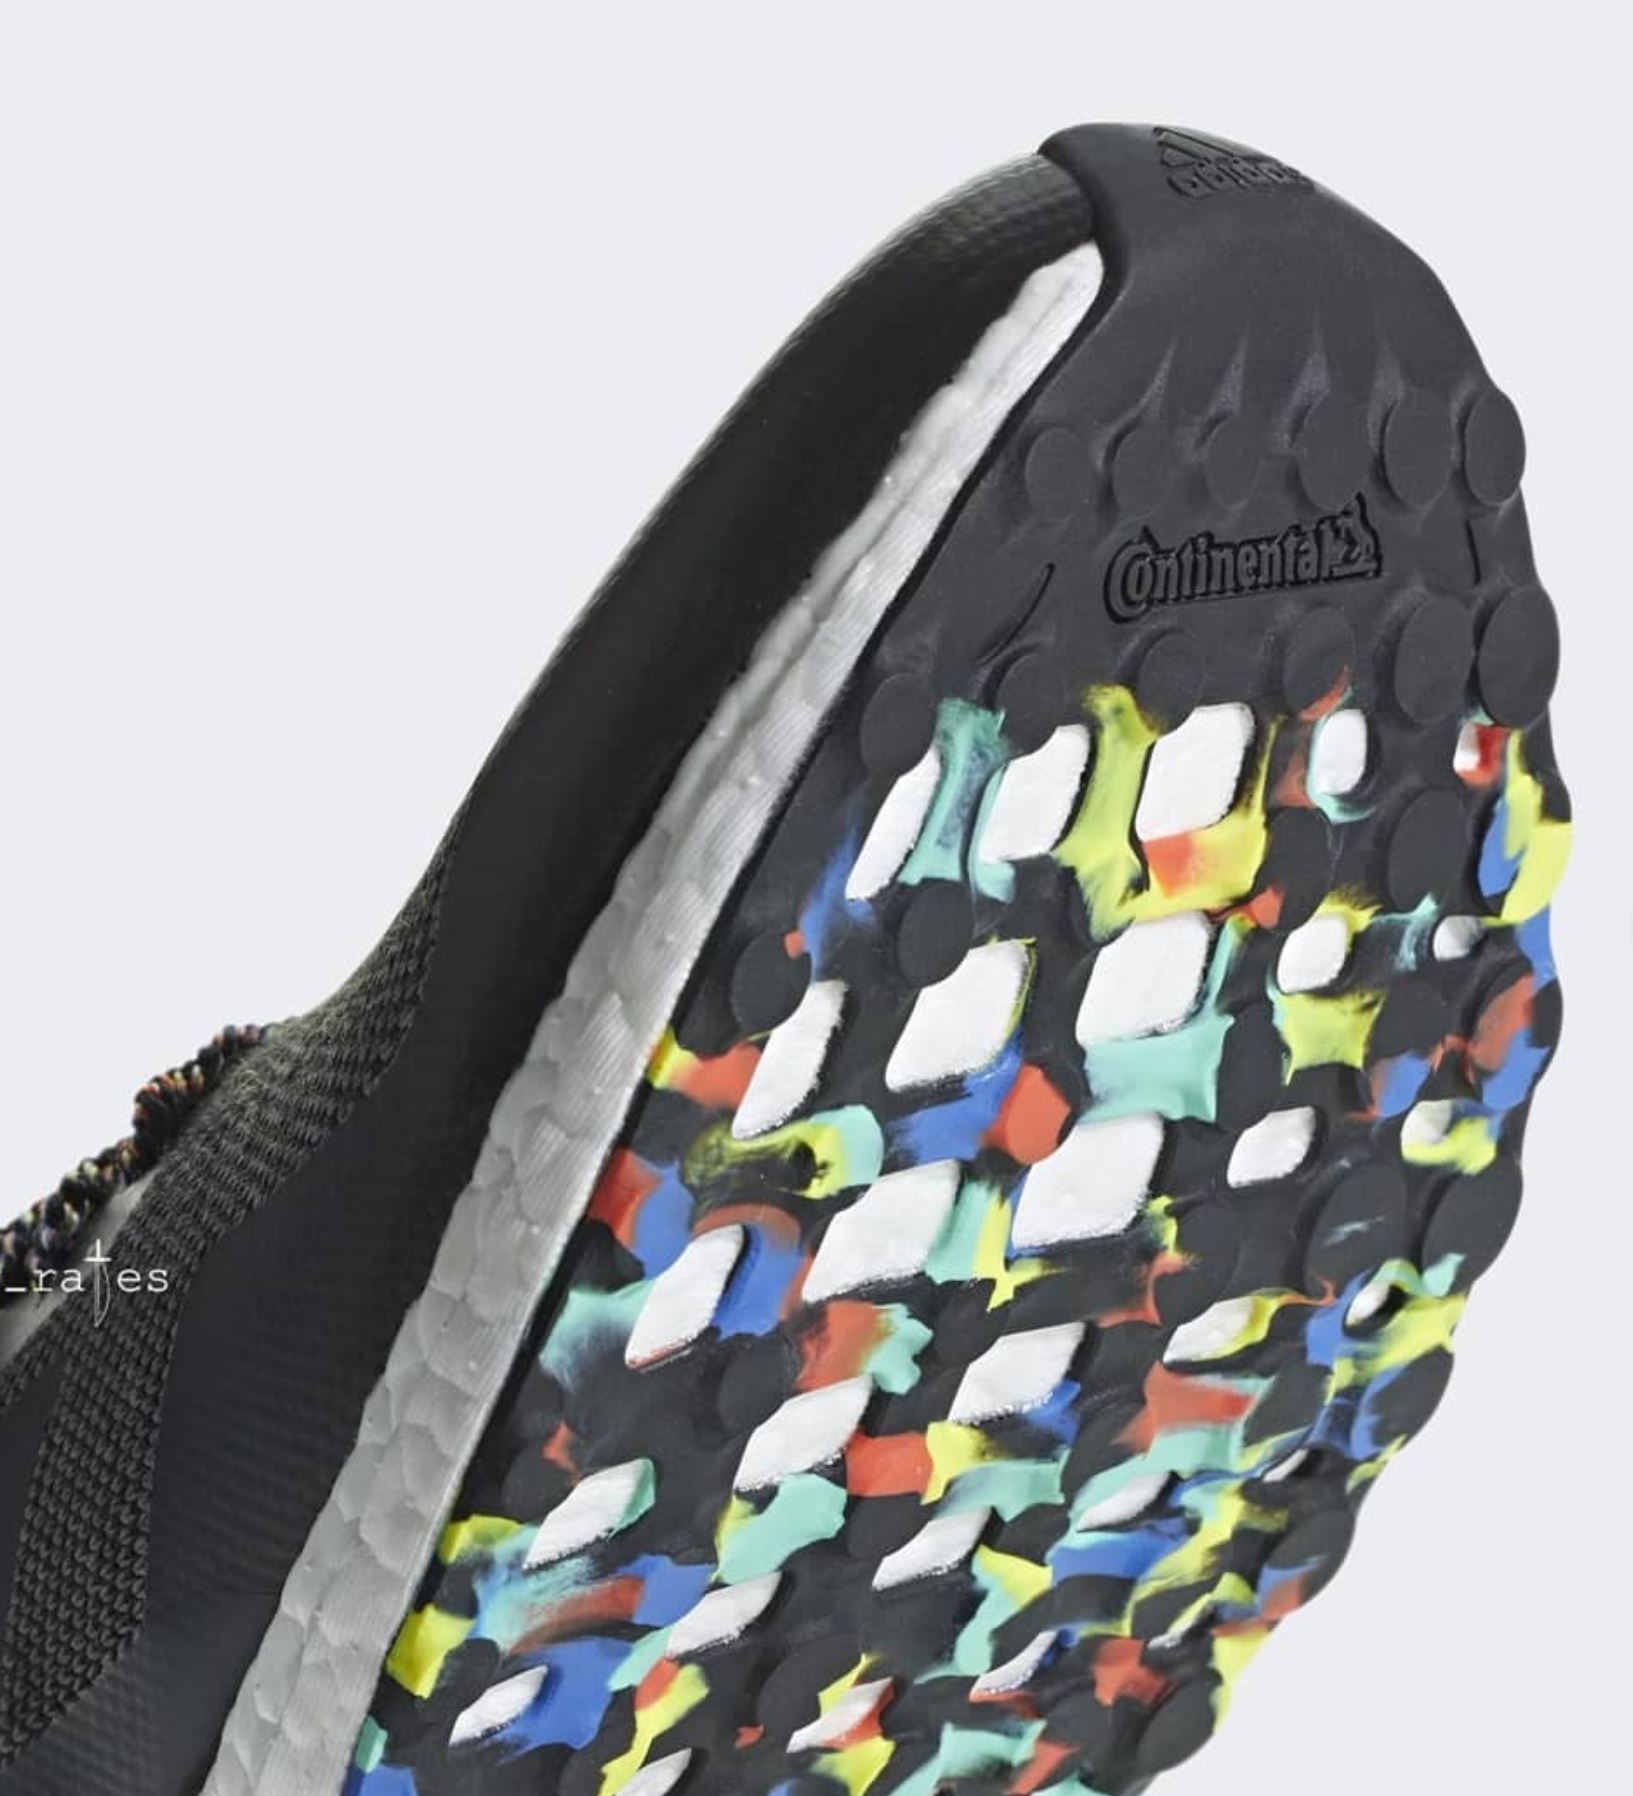 7495e7be9c589 adidas ultra boost mid multicolor black outsole - WearTesters